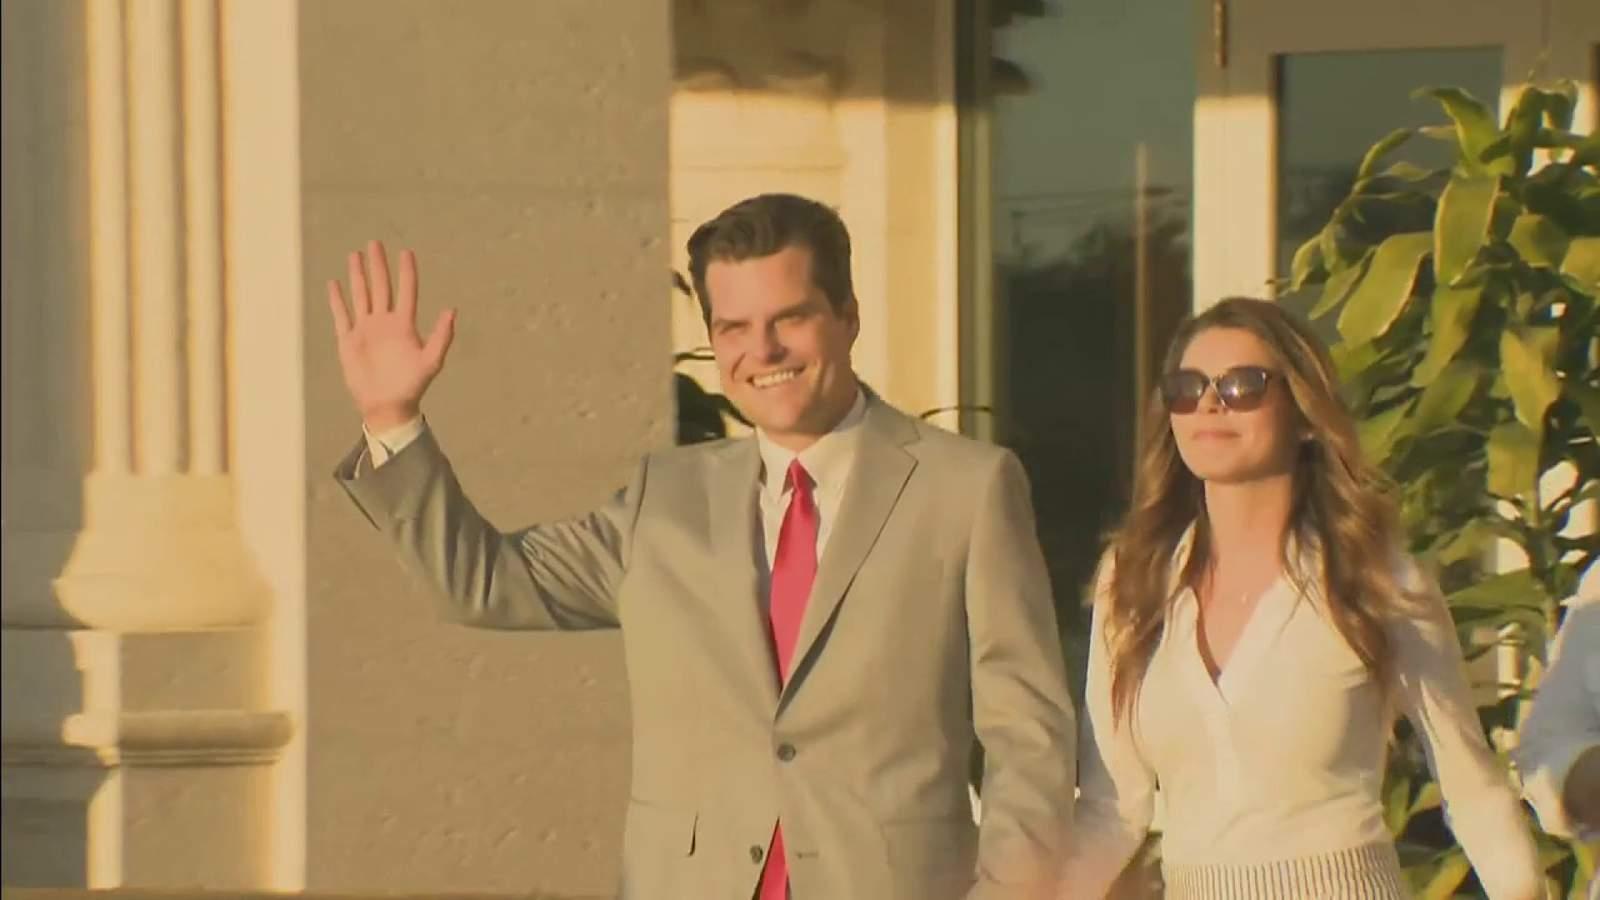 Rep. Matt Gaetz allegedly connected to Florida shill candidate scheme